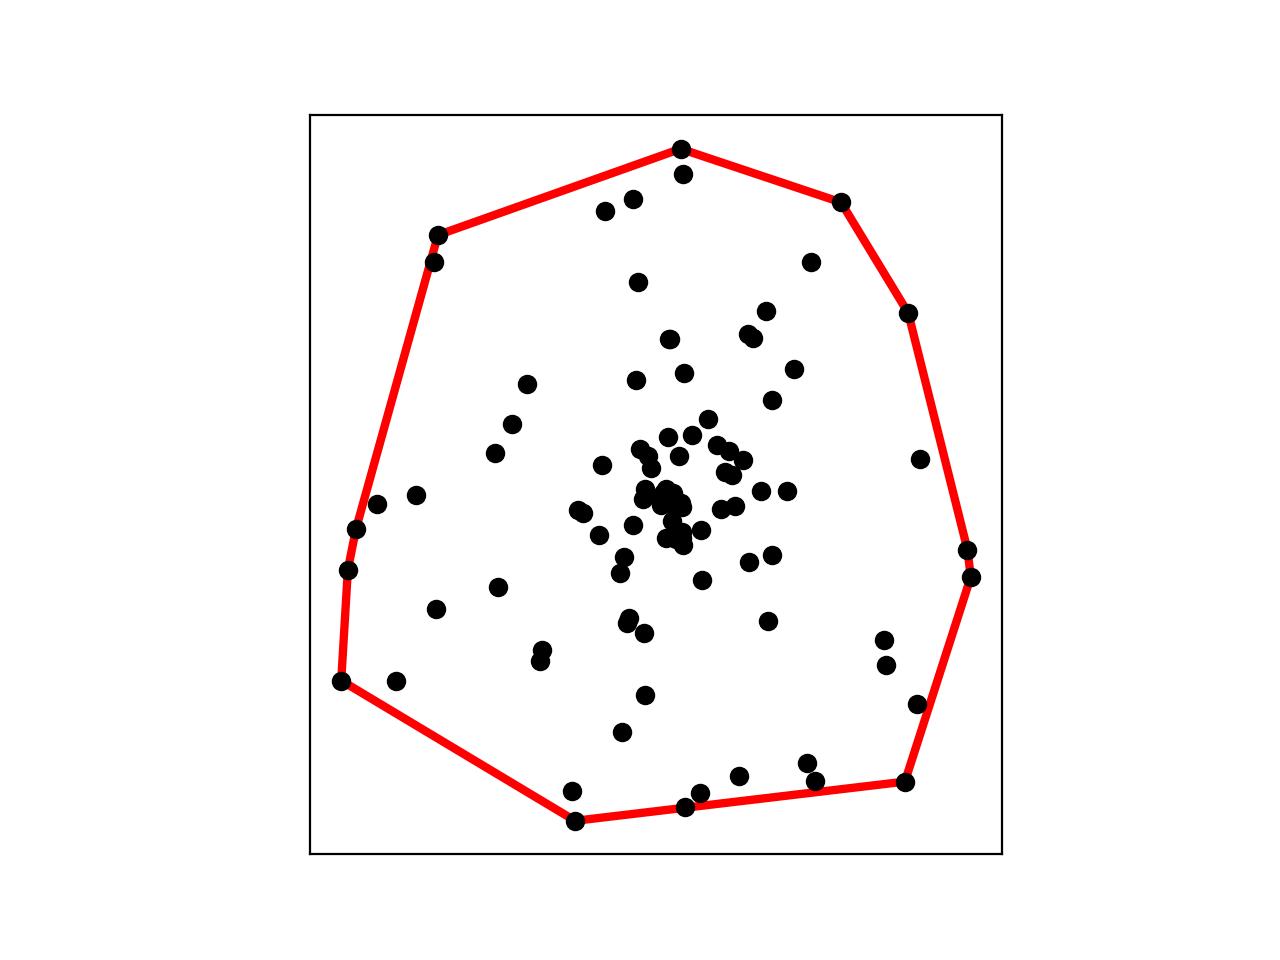 Convex Hulls and Mesh Boundaries — Triangle 20190115 3 documentation